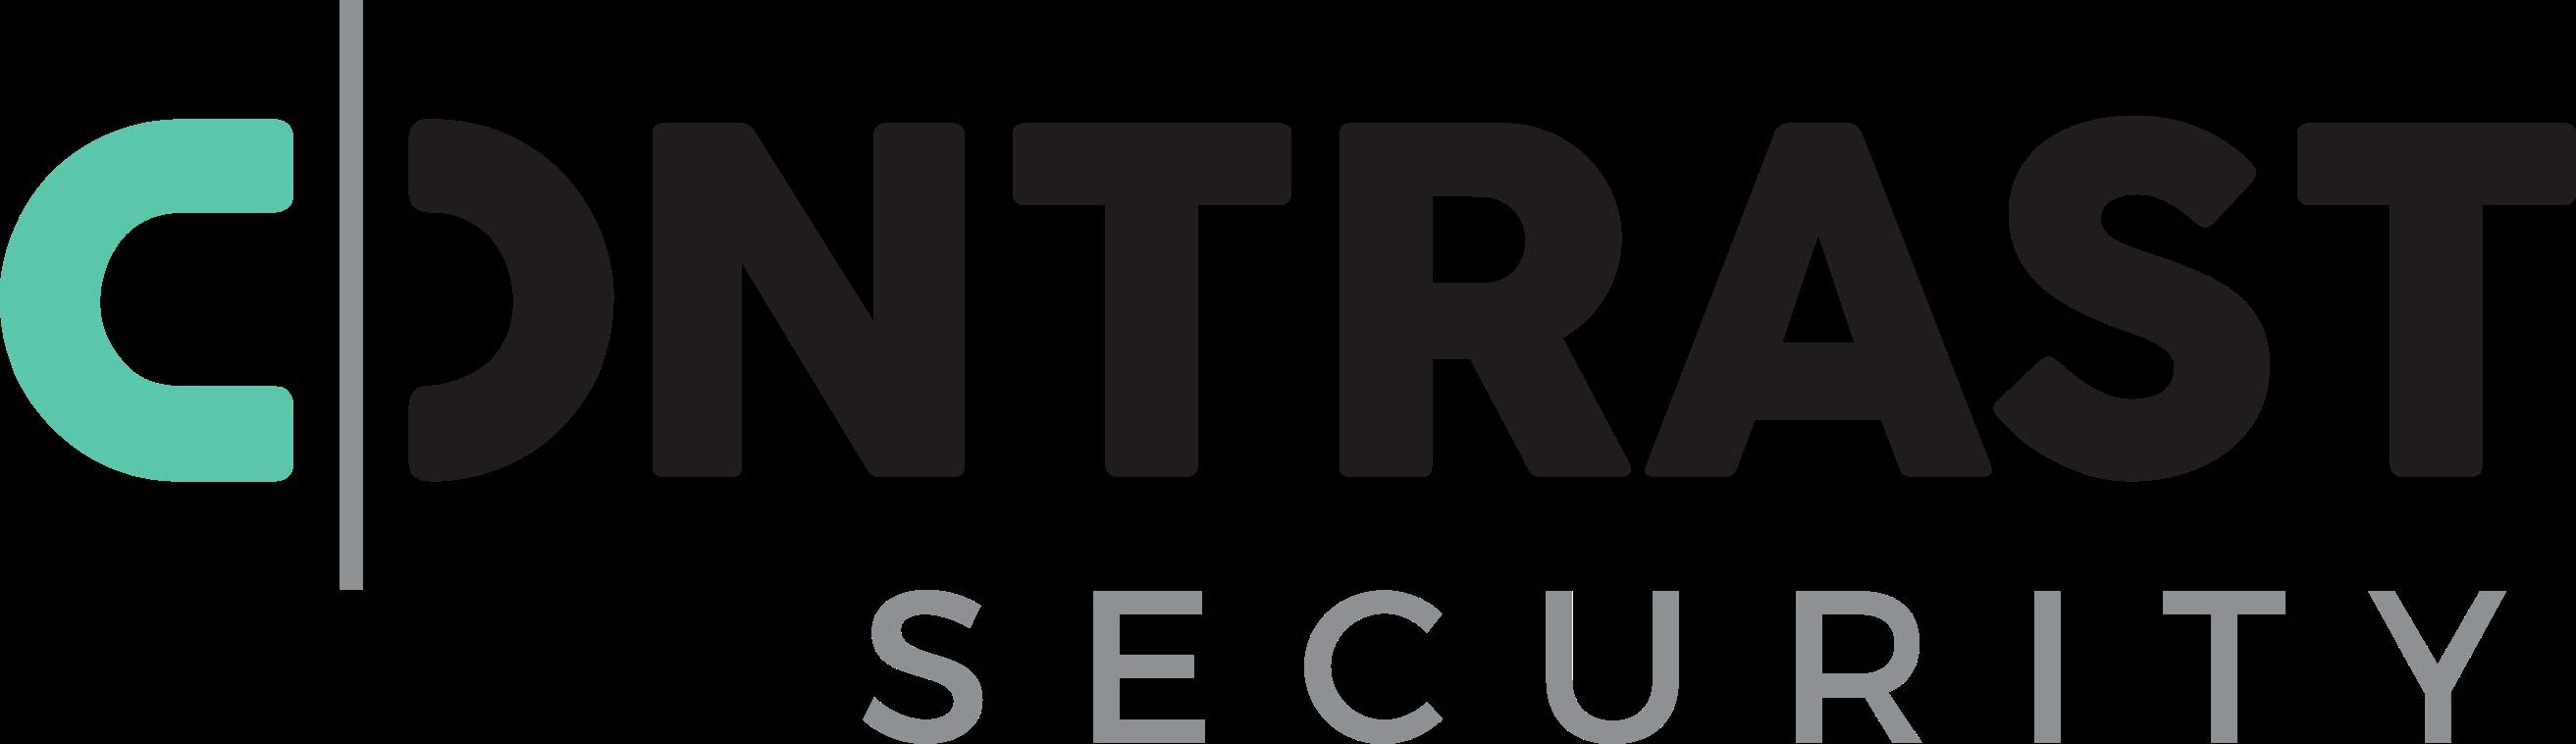 Contrast Security (1)